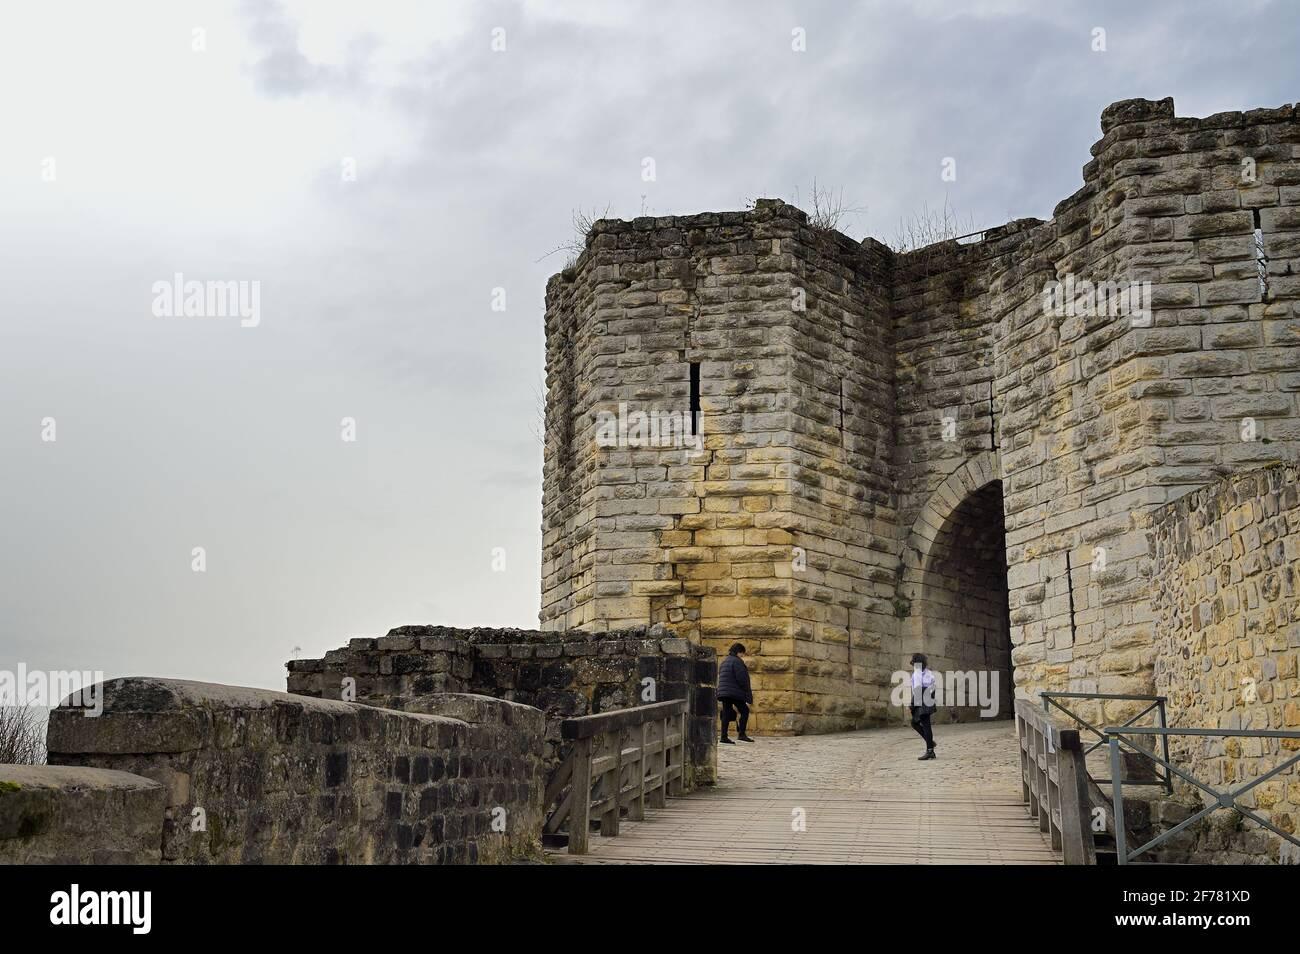 Frankreich, Aisne, Château-Thierry, das Saint-Jean-Tor des alten Schlosses Stockfoto